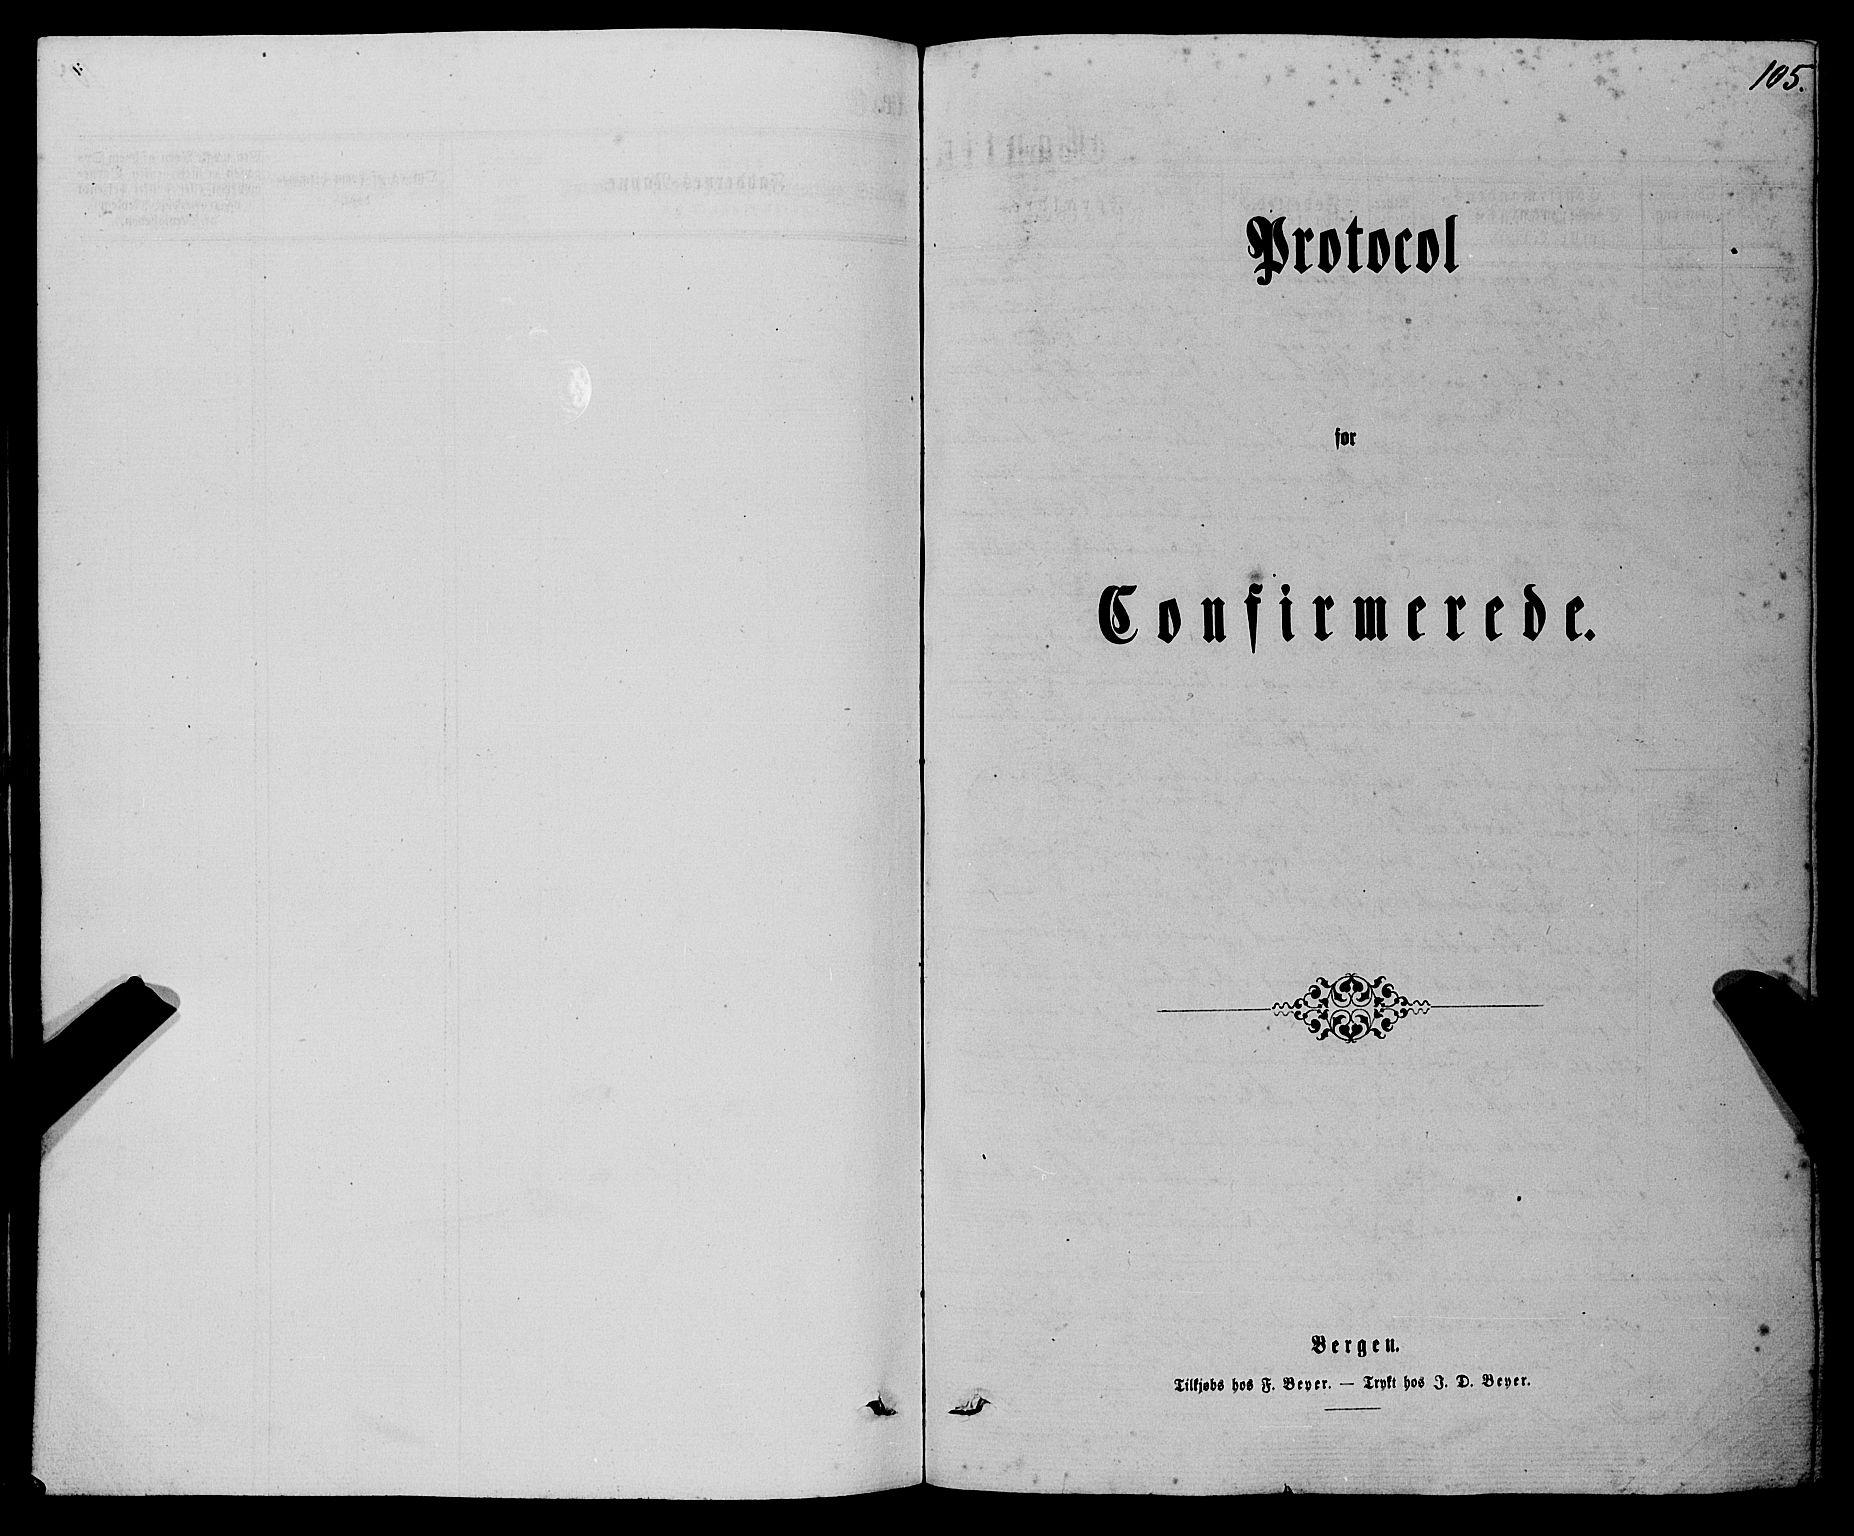 SAB, Finnås sokneprestembete, H/Ha/Haa/Haaa/L0008: Ministerialbok nr. A 8, 1863-1872, s. 105